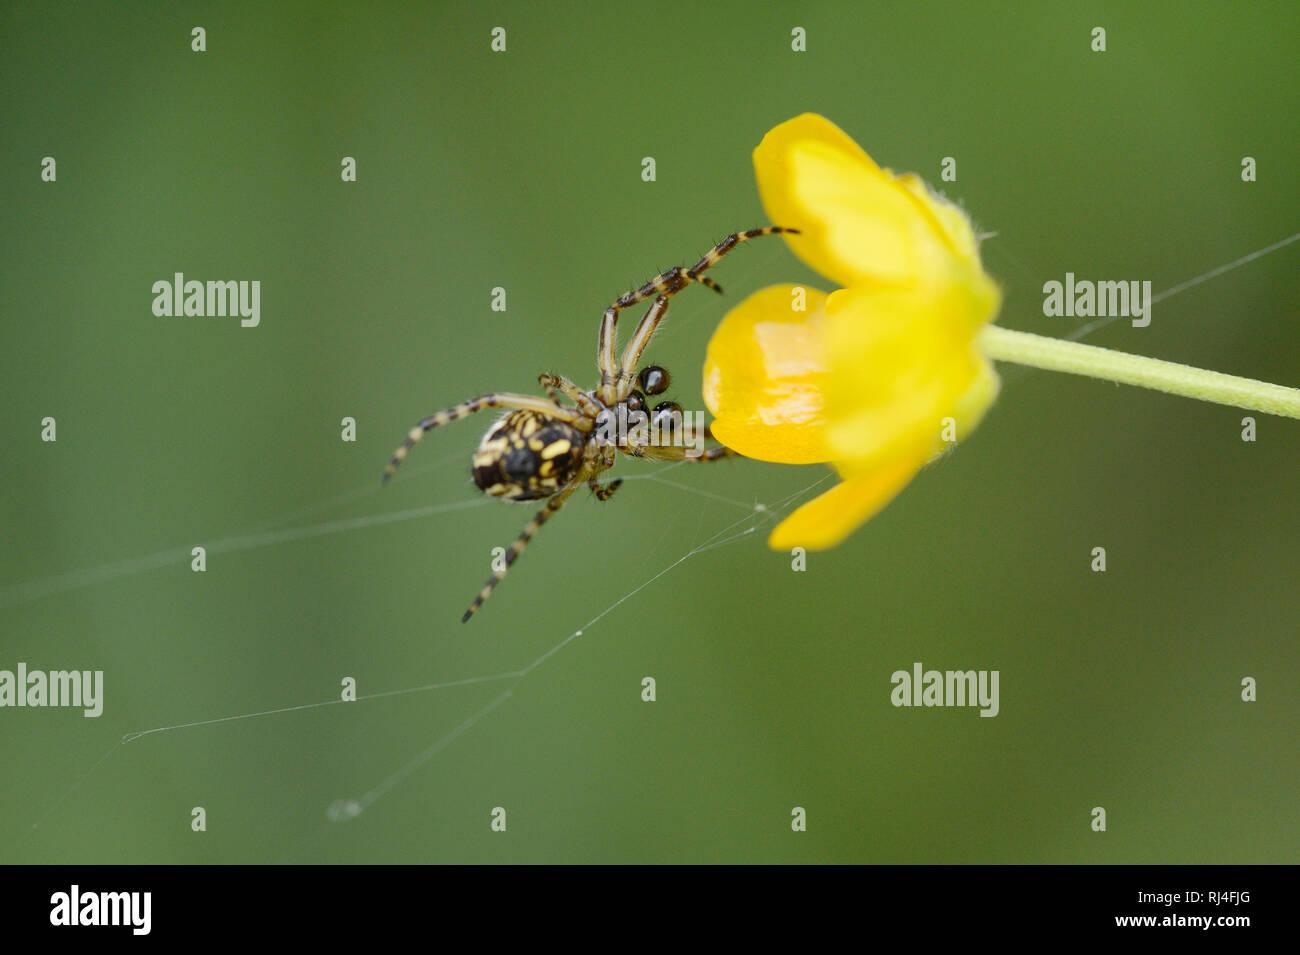 Eichblatt-Kreuzspinne, Aculepeira ceropegia, Bl?te, Netz, Nahaufnahme - Stock Image